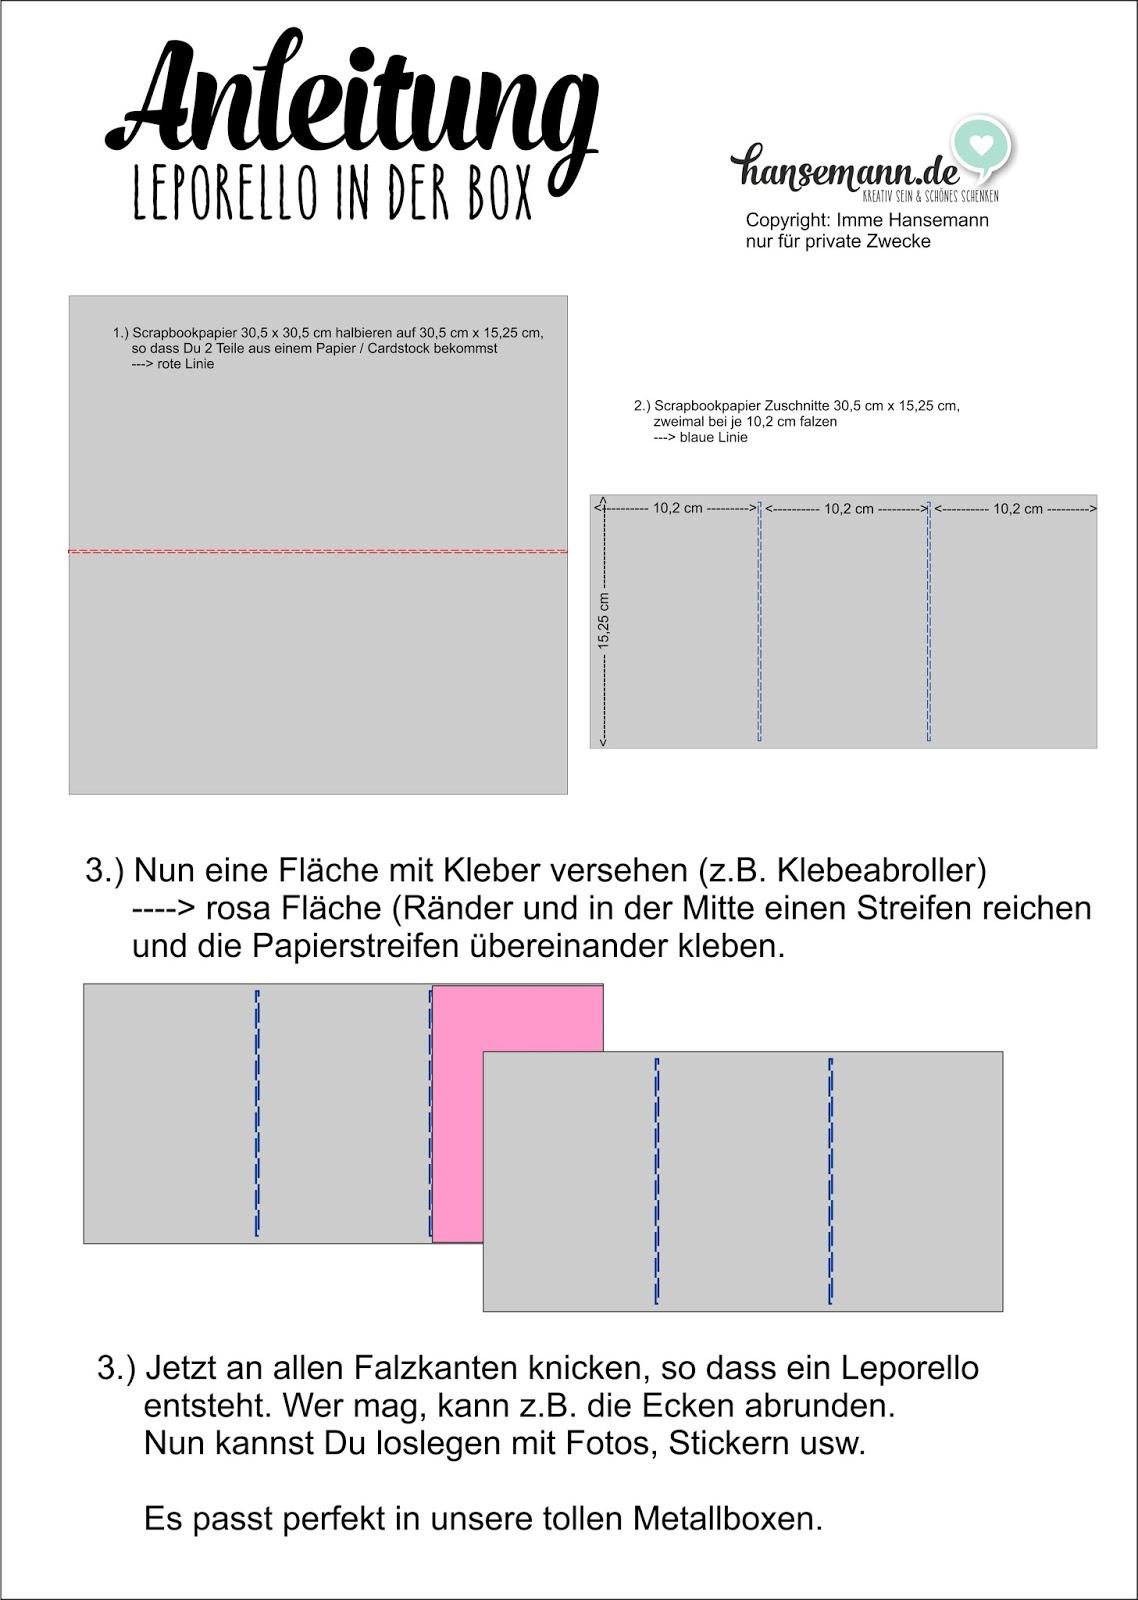 Häufig Anleitung - DIY Leporello in der Dose -Teil 1 | made-by-imme.de QW89